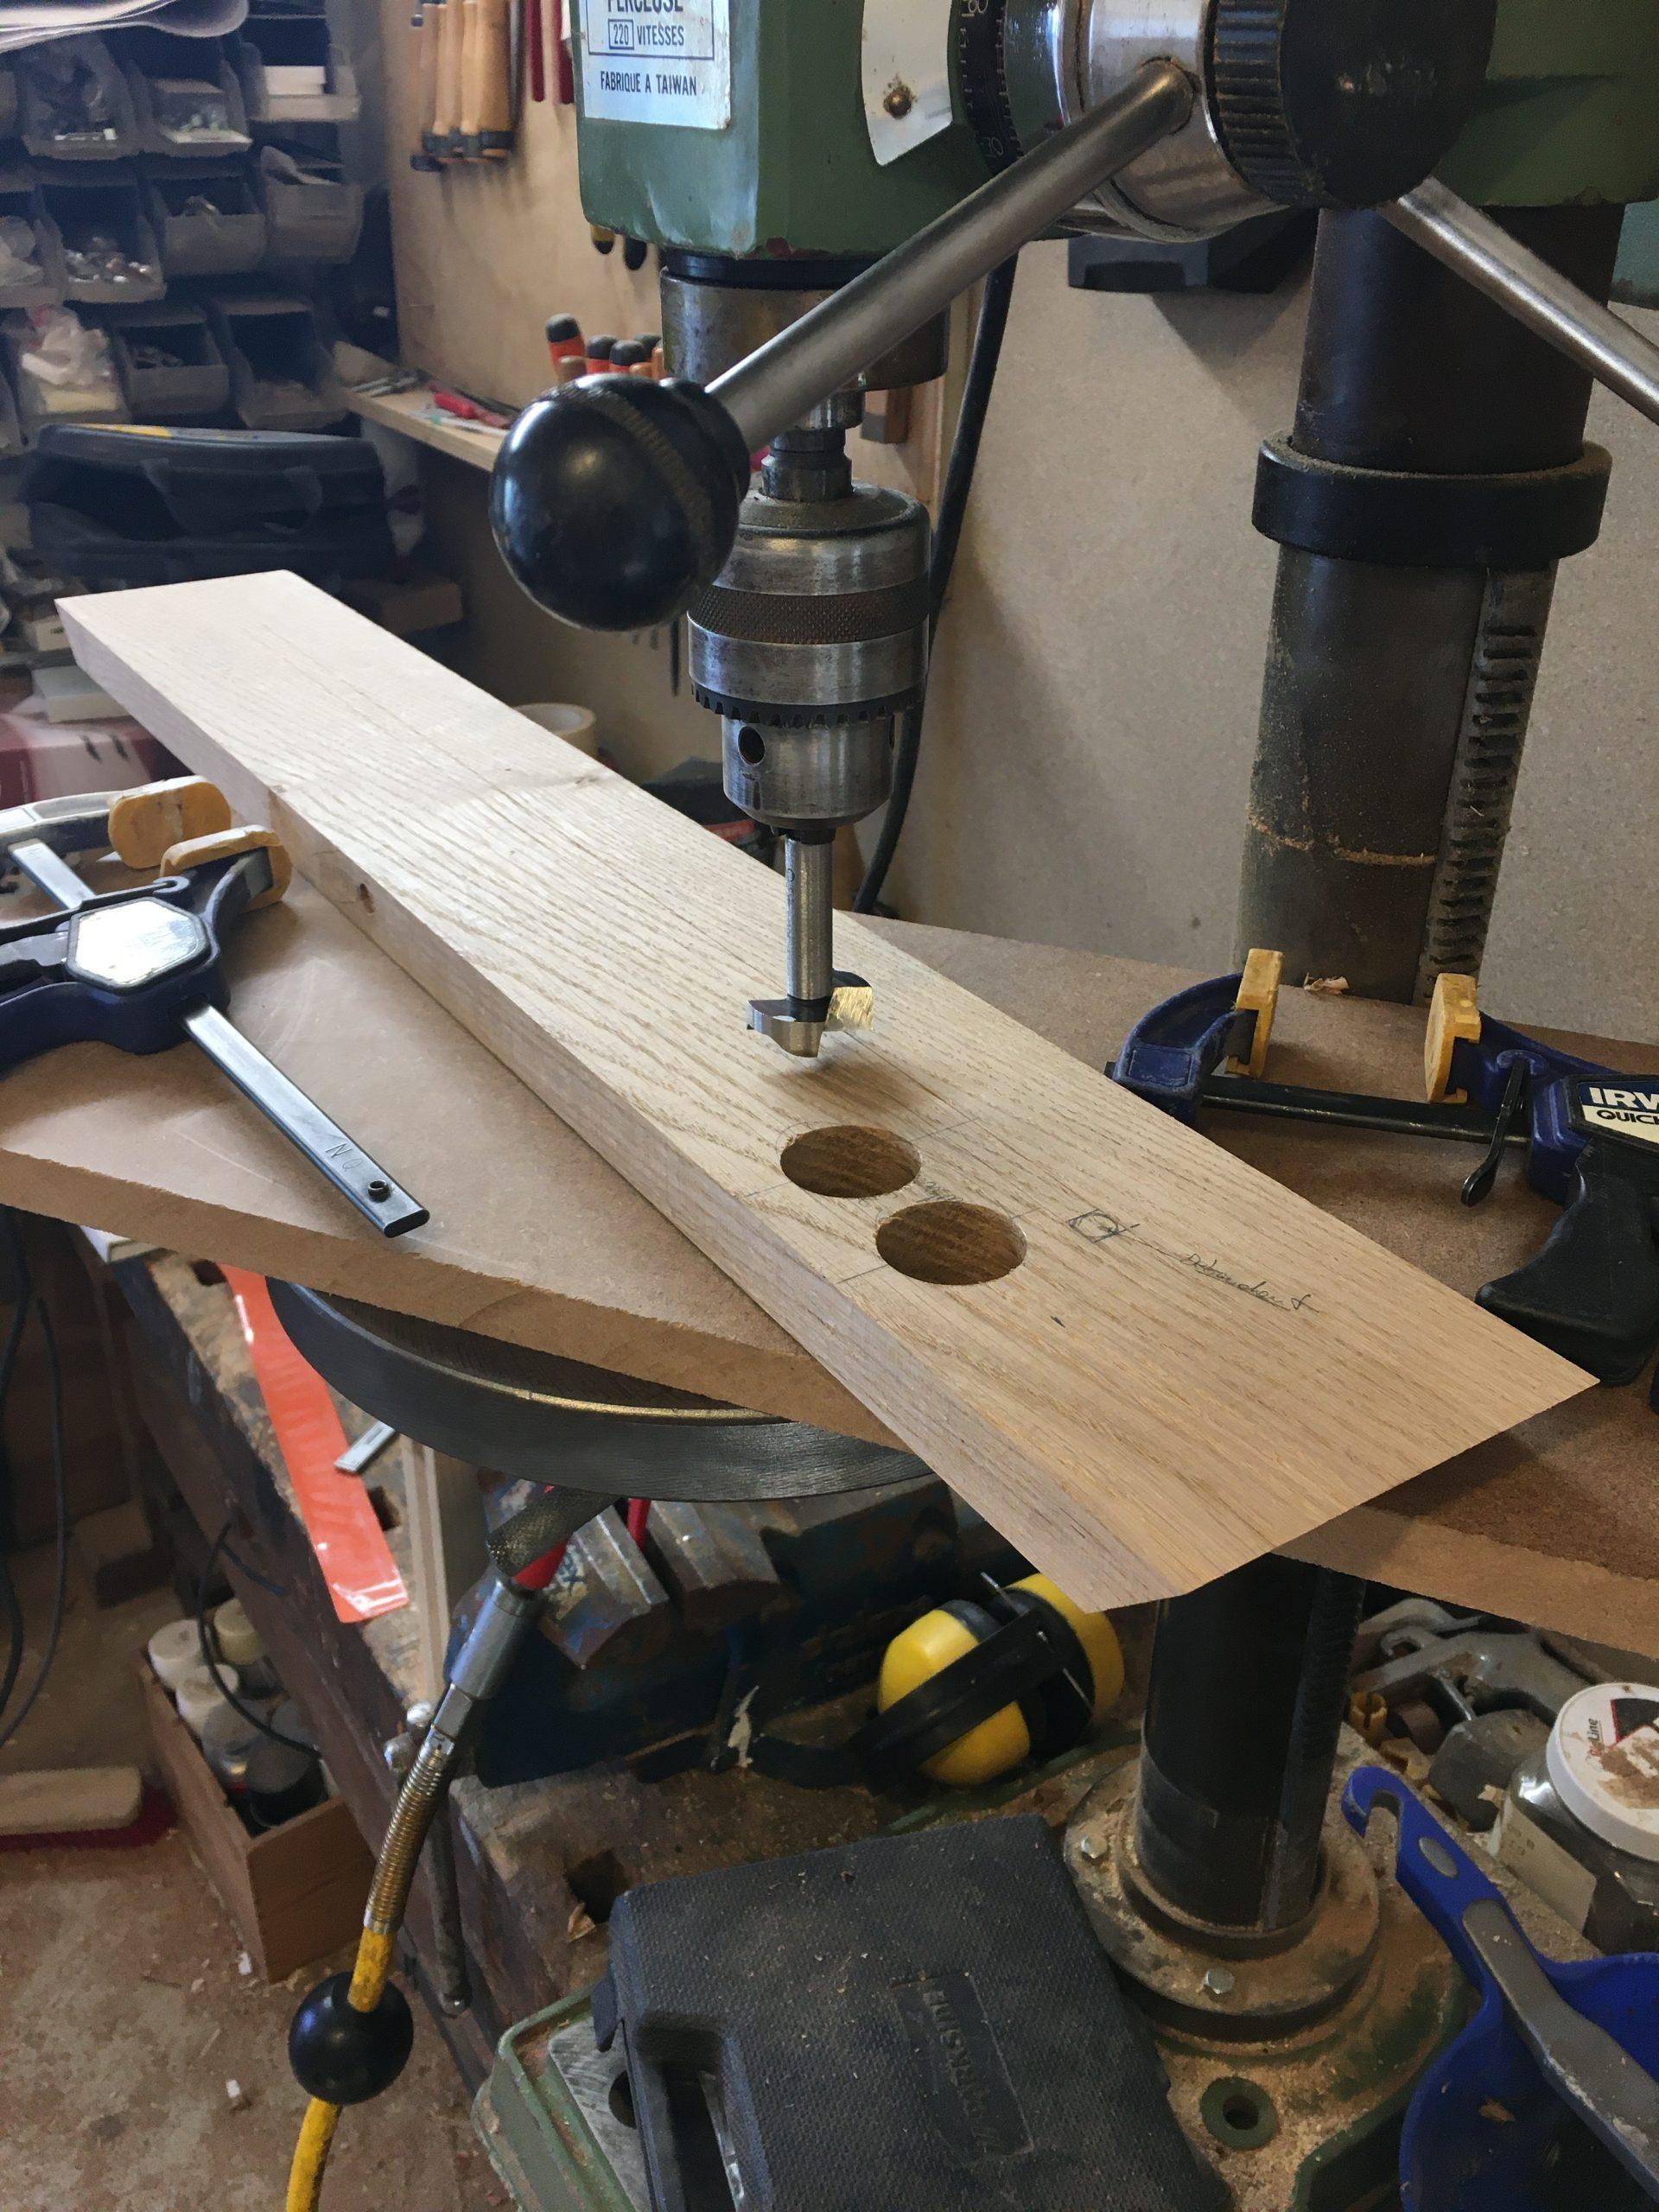 plan fabrication magic mirror 3